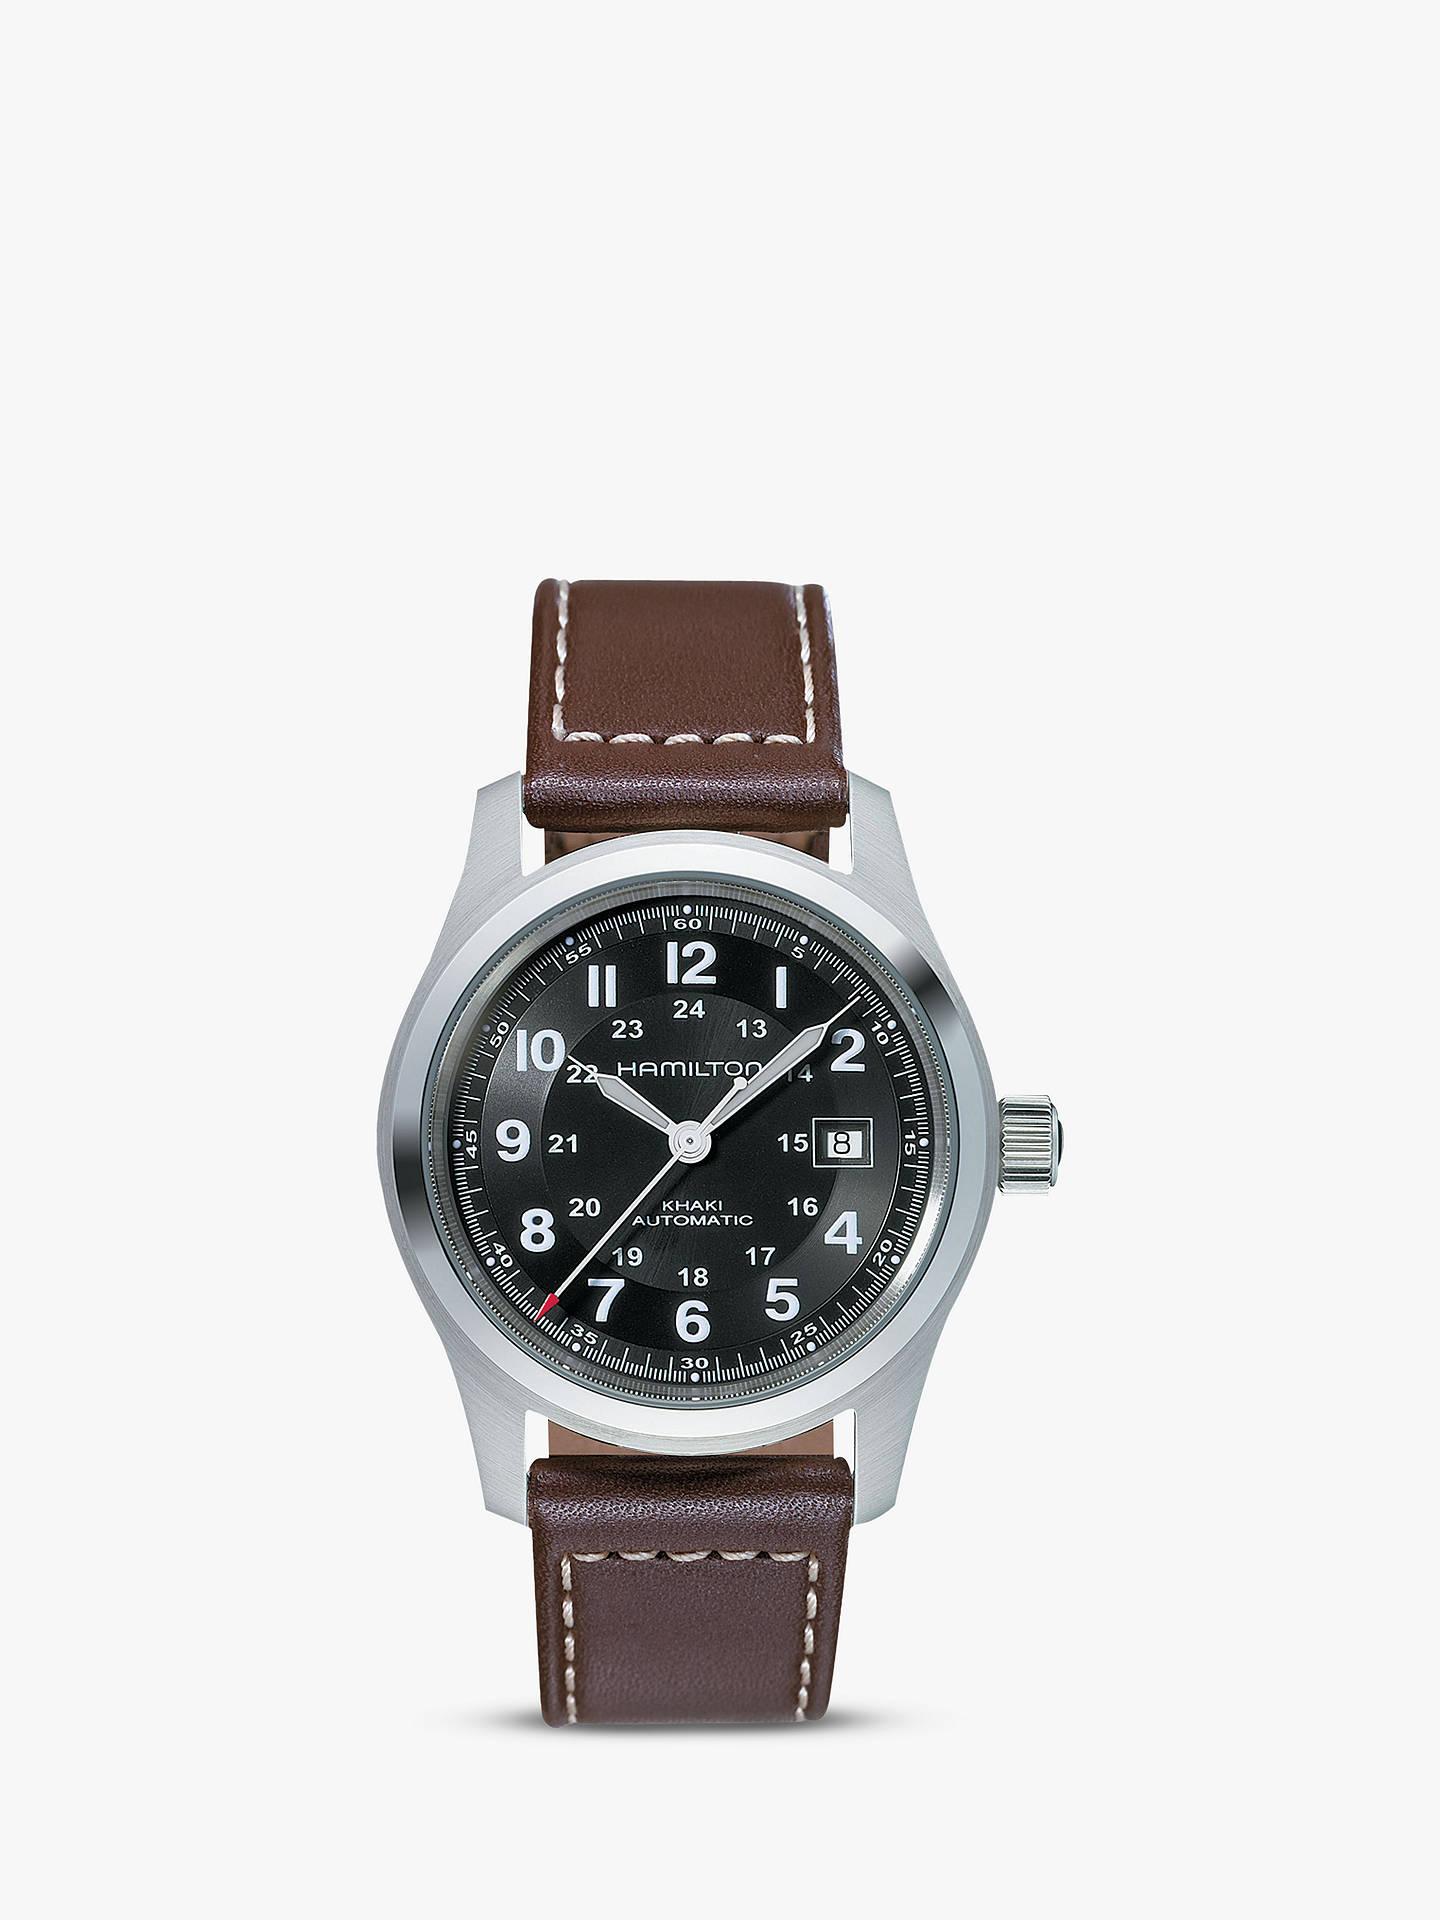 Hamilton H70555533 Men S Khaki Field Automatic Date Leather Strap Watch Dark Brown Black